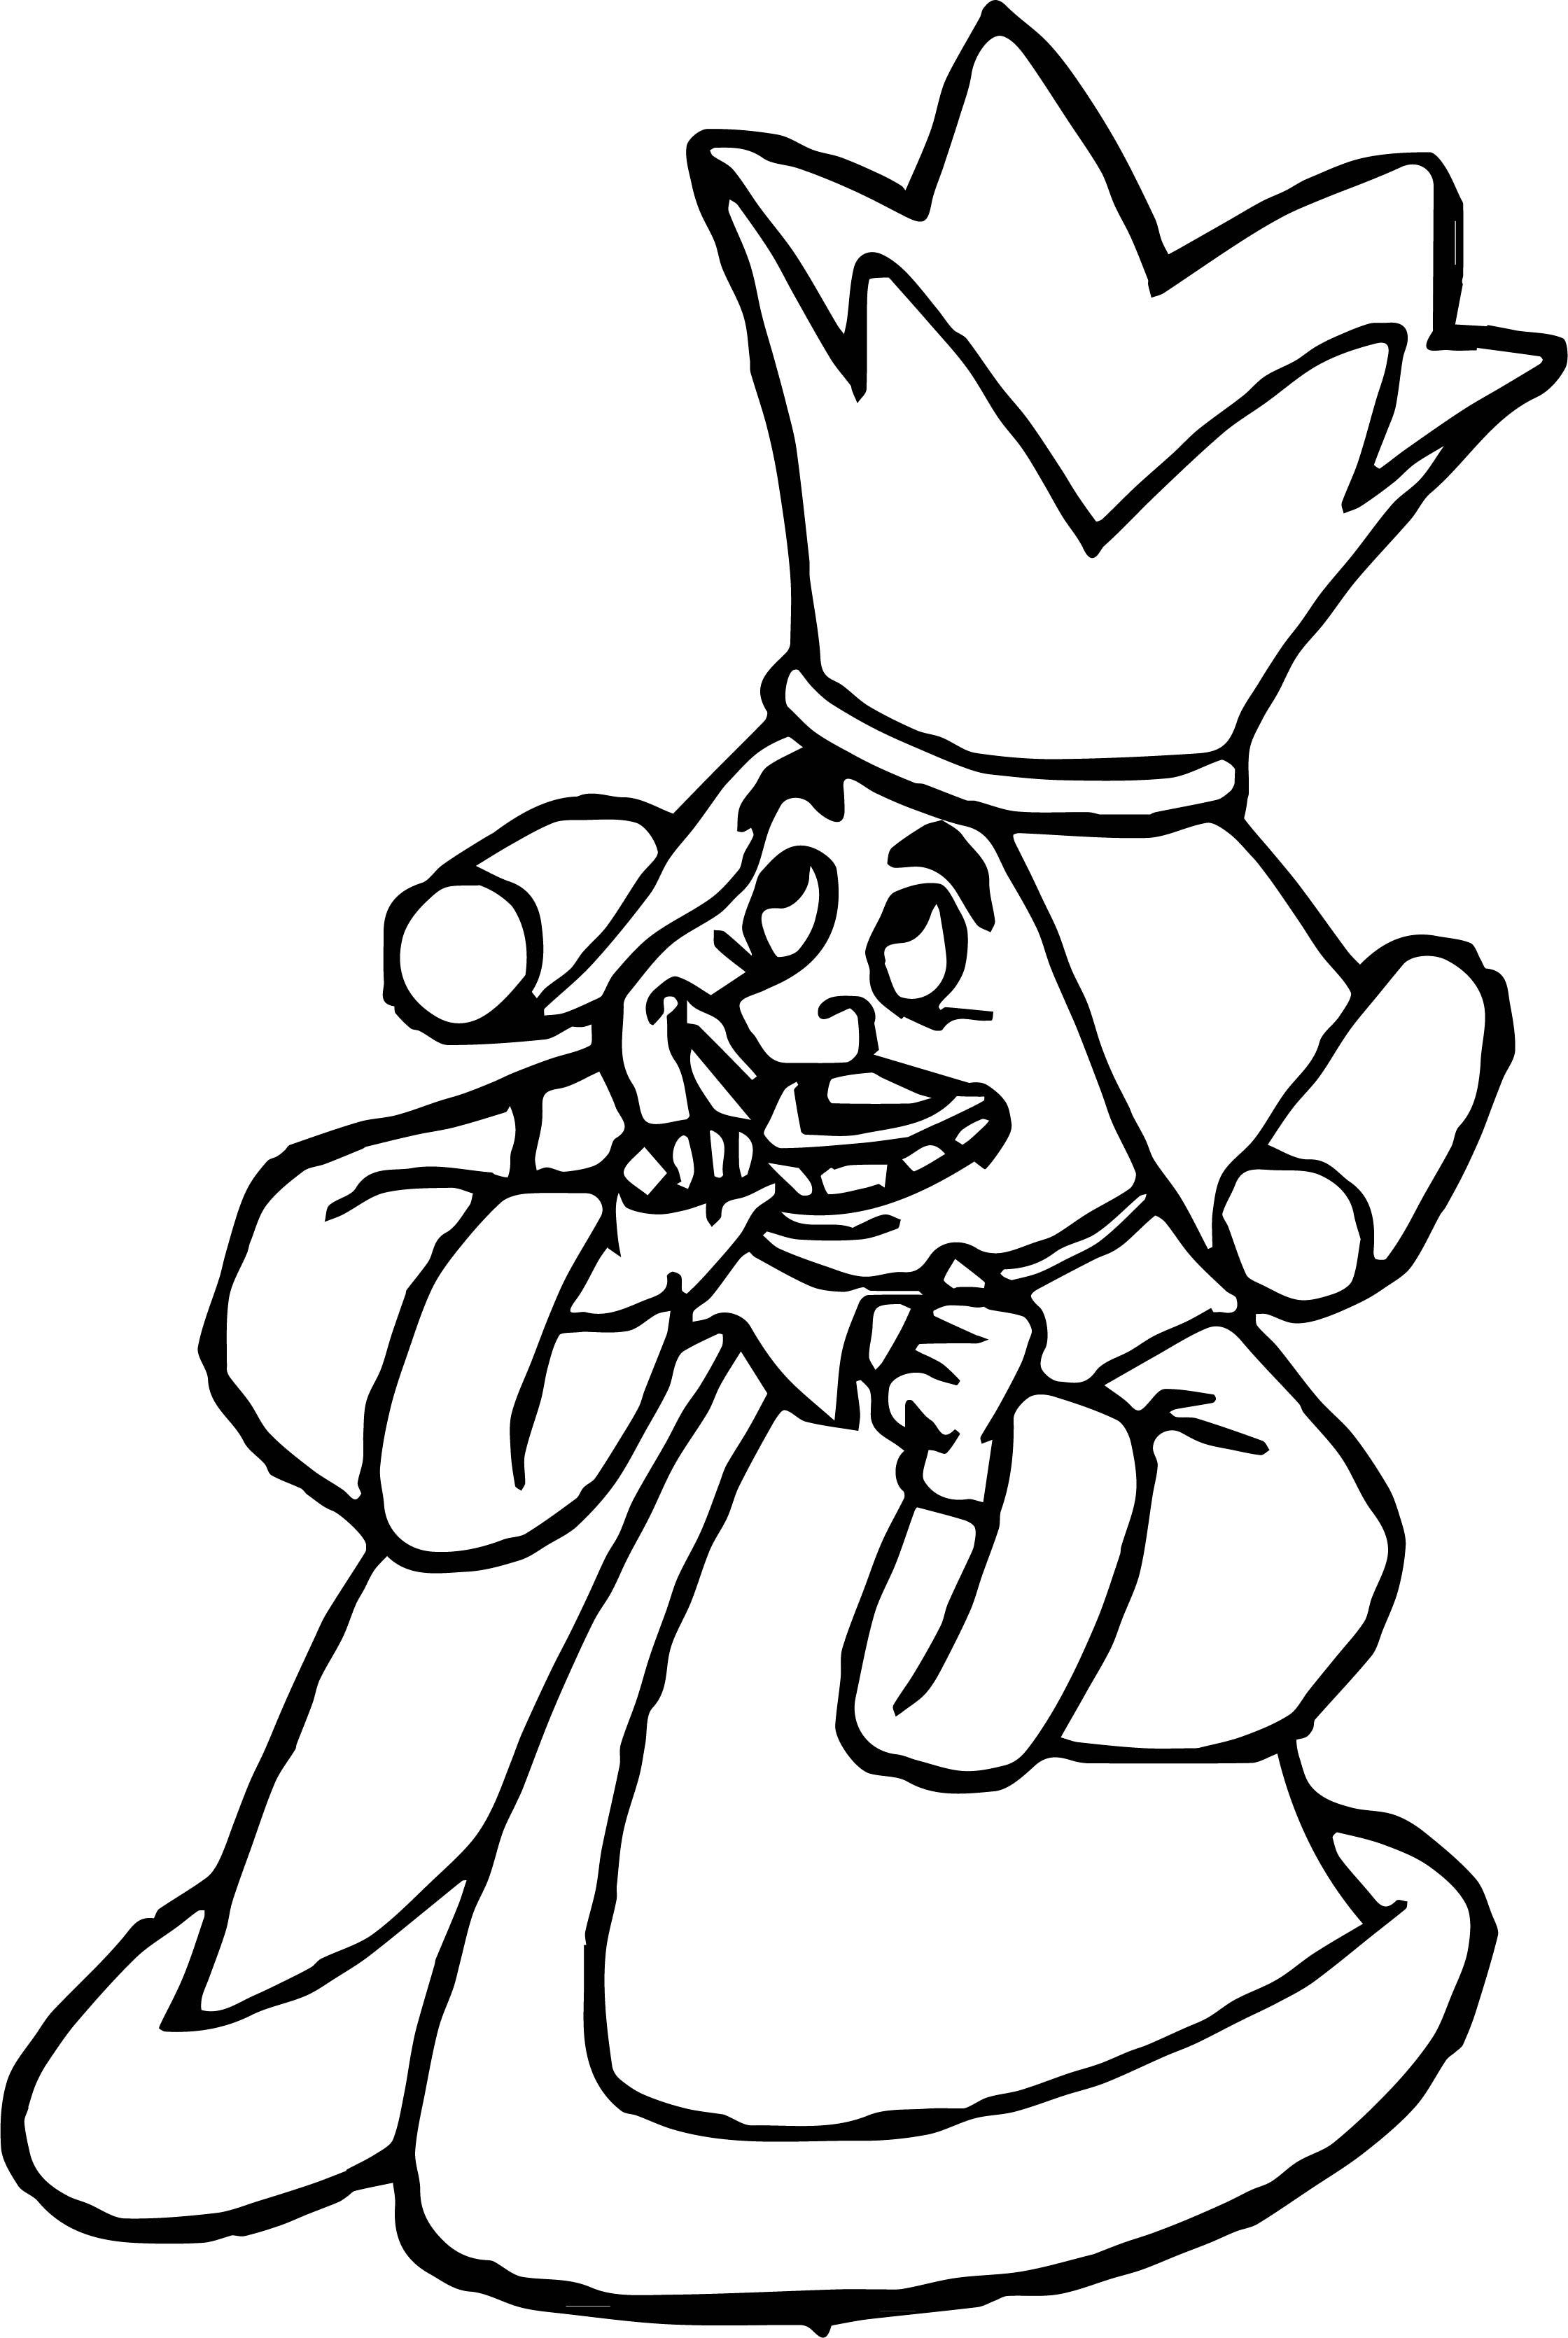 Alice In Wonderland Clock Drawing At GetDrawings